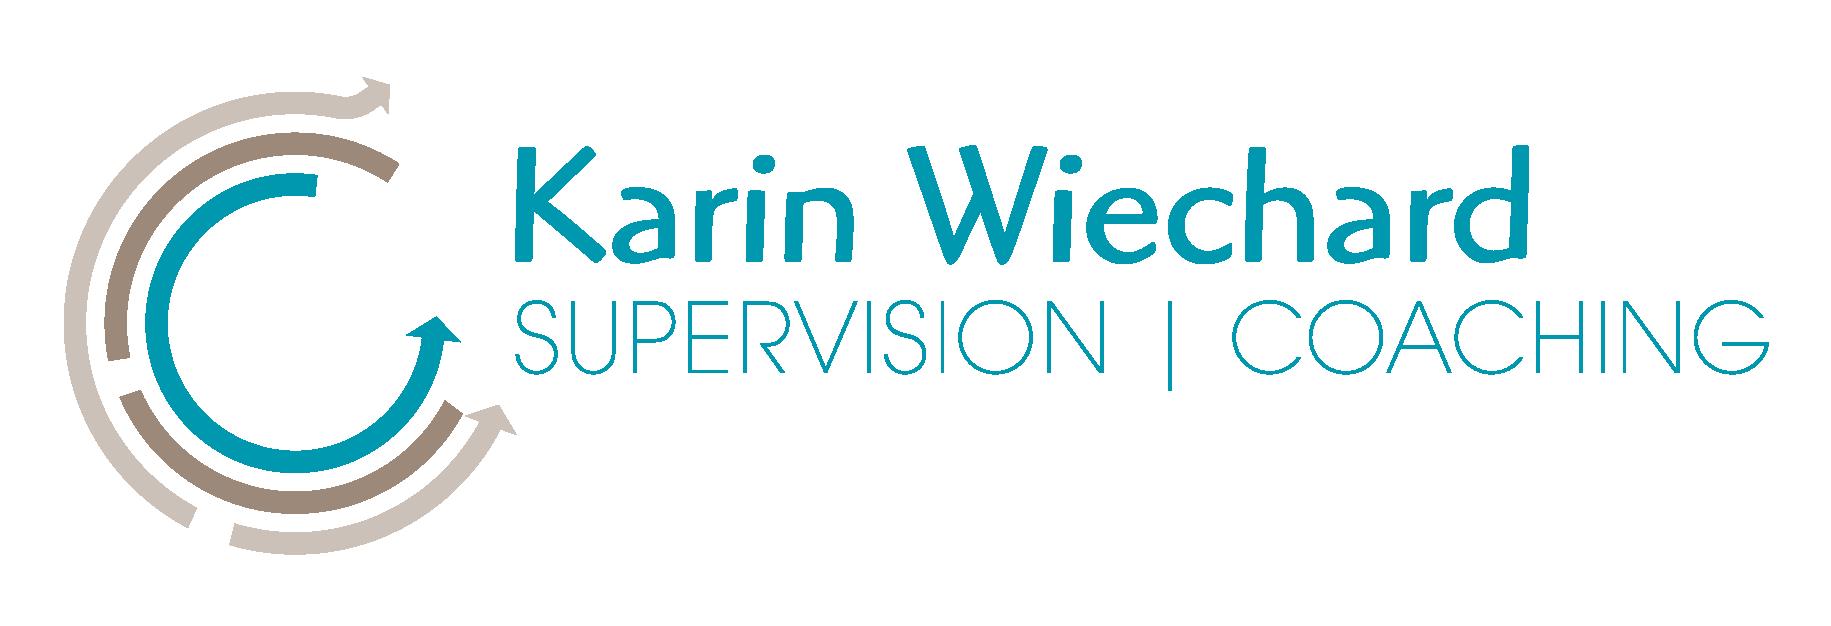 wiechard supervision